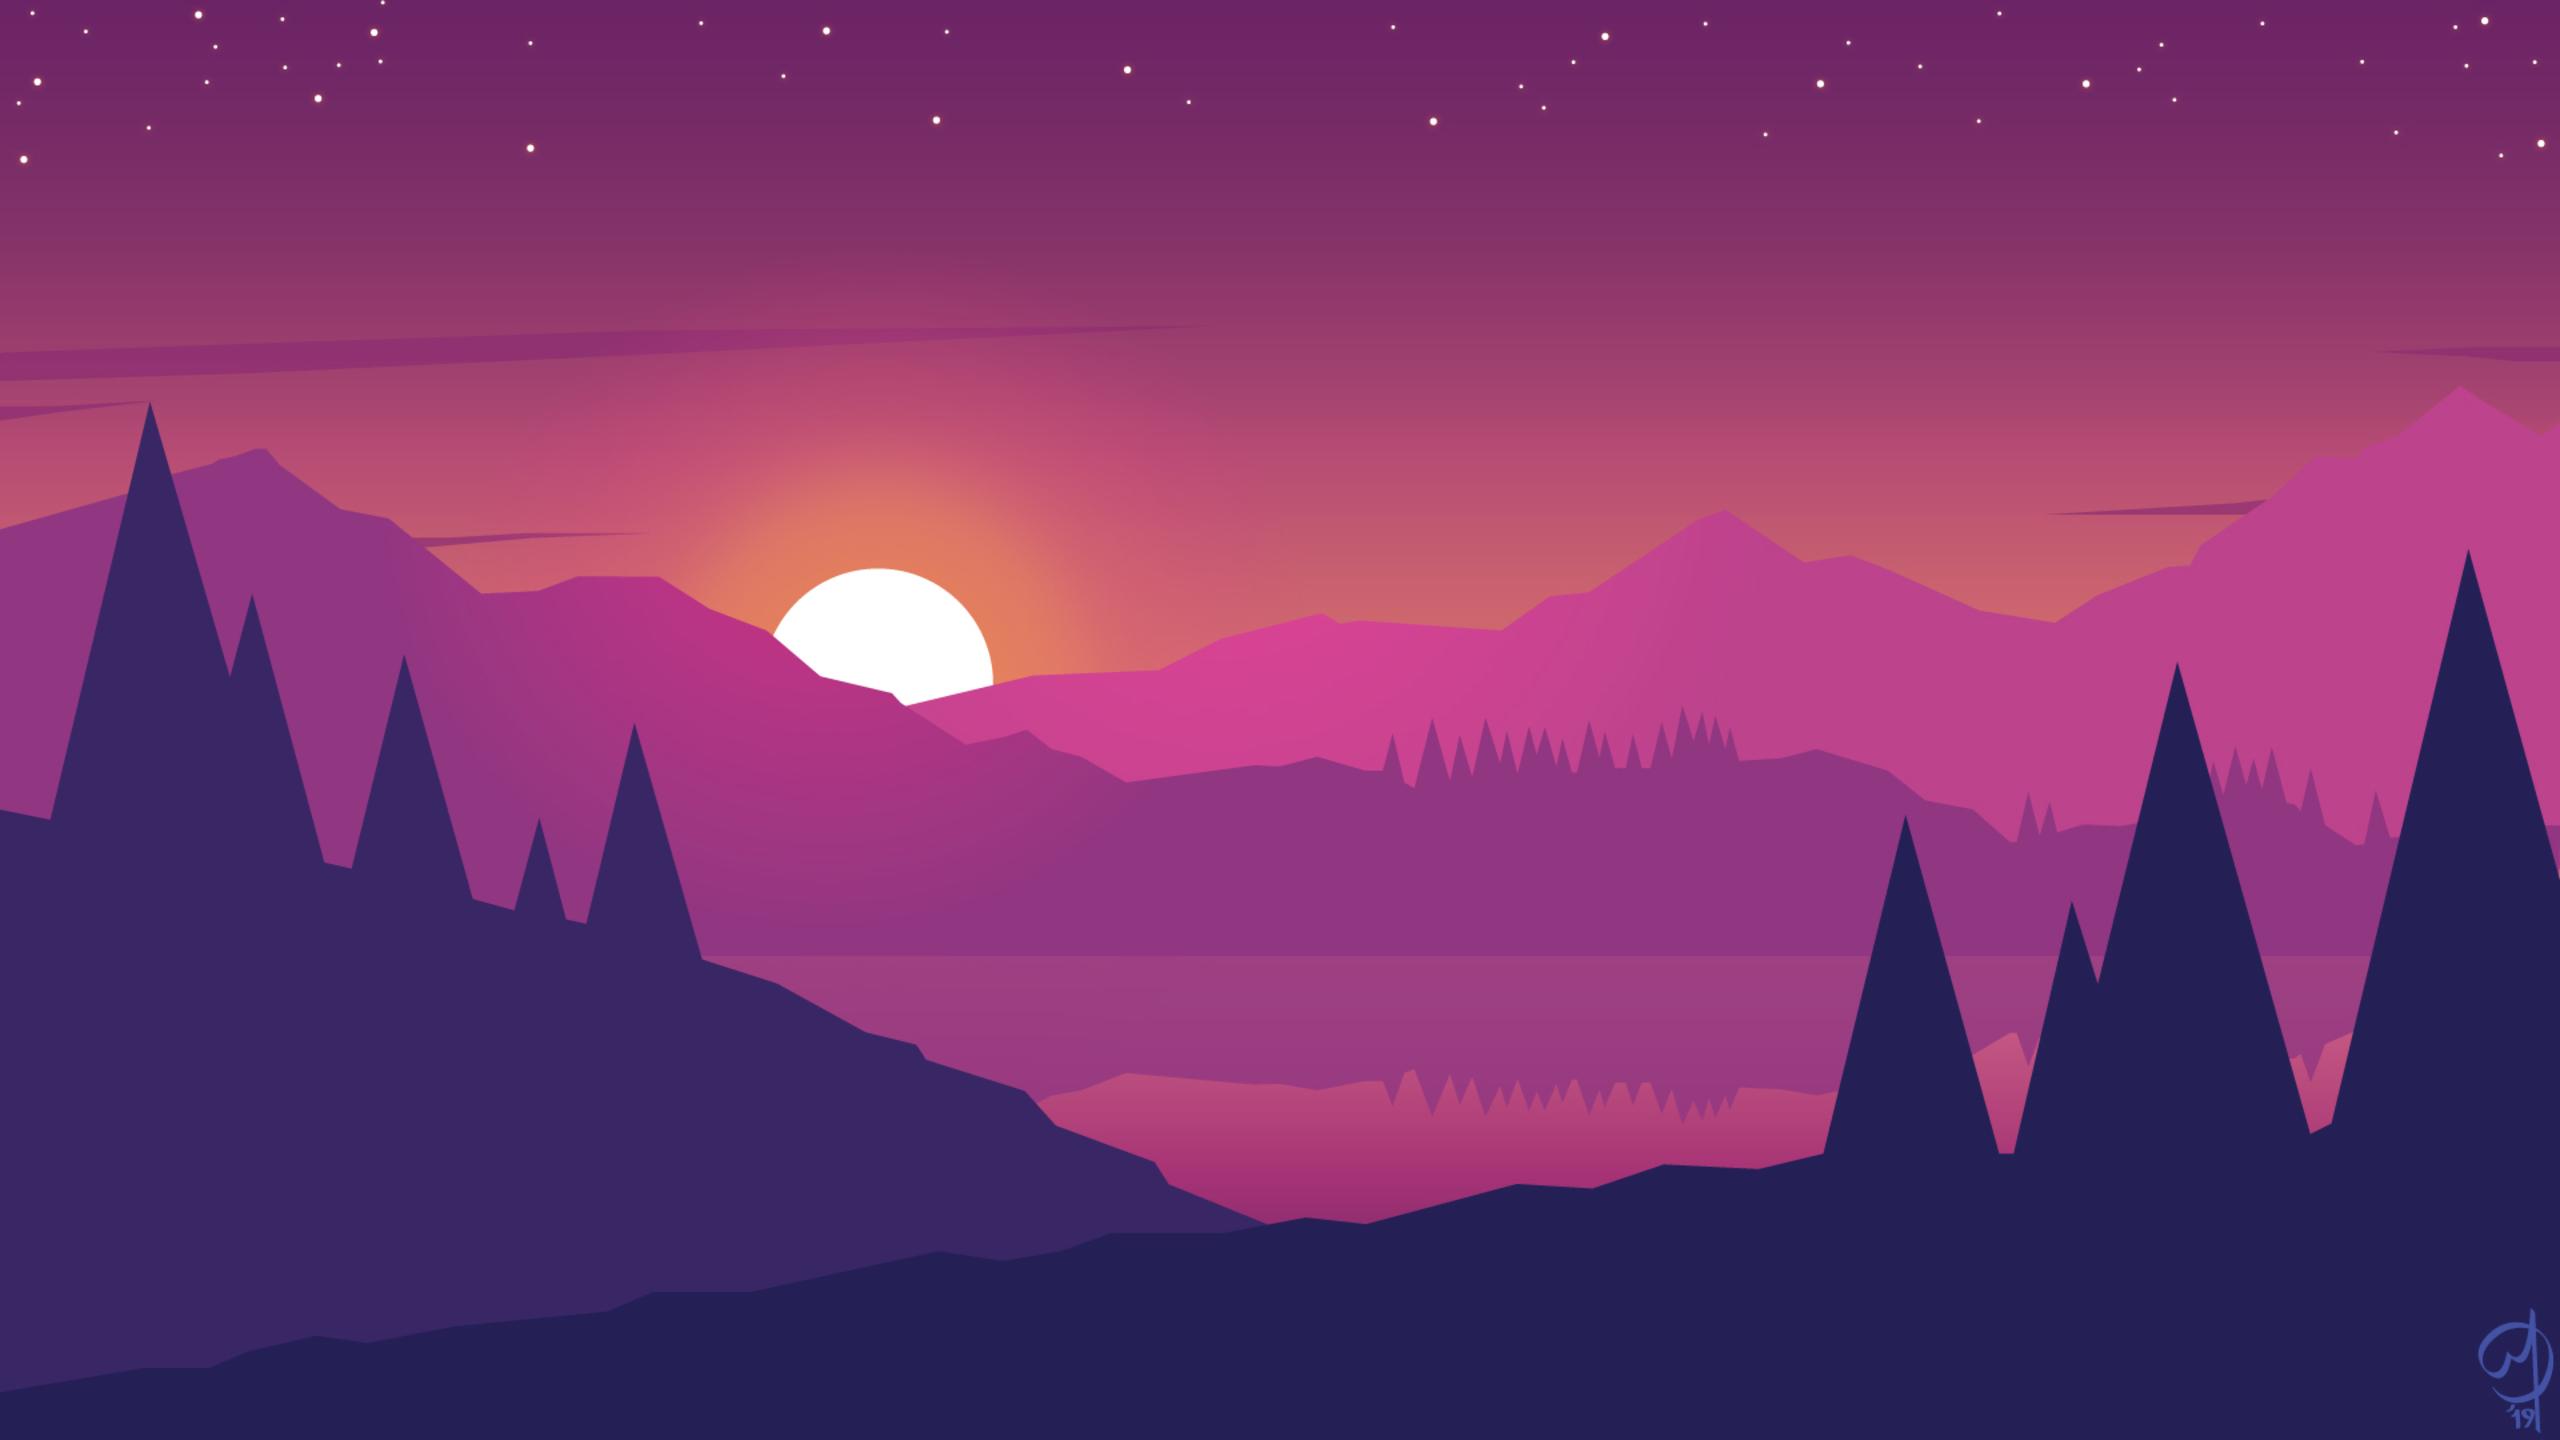 2560x1440 Minimalist Mountains Landscape Scenery 1440p